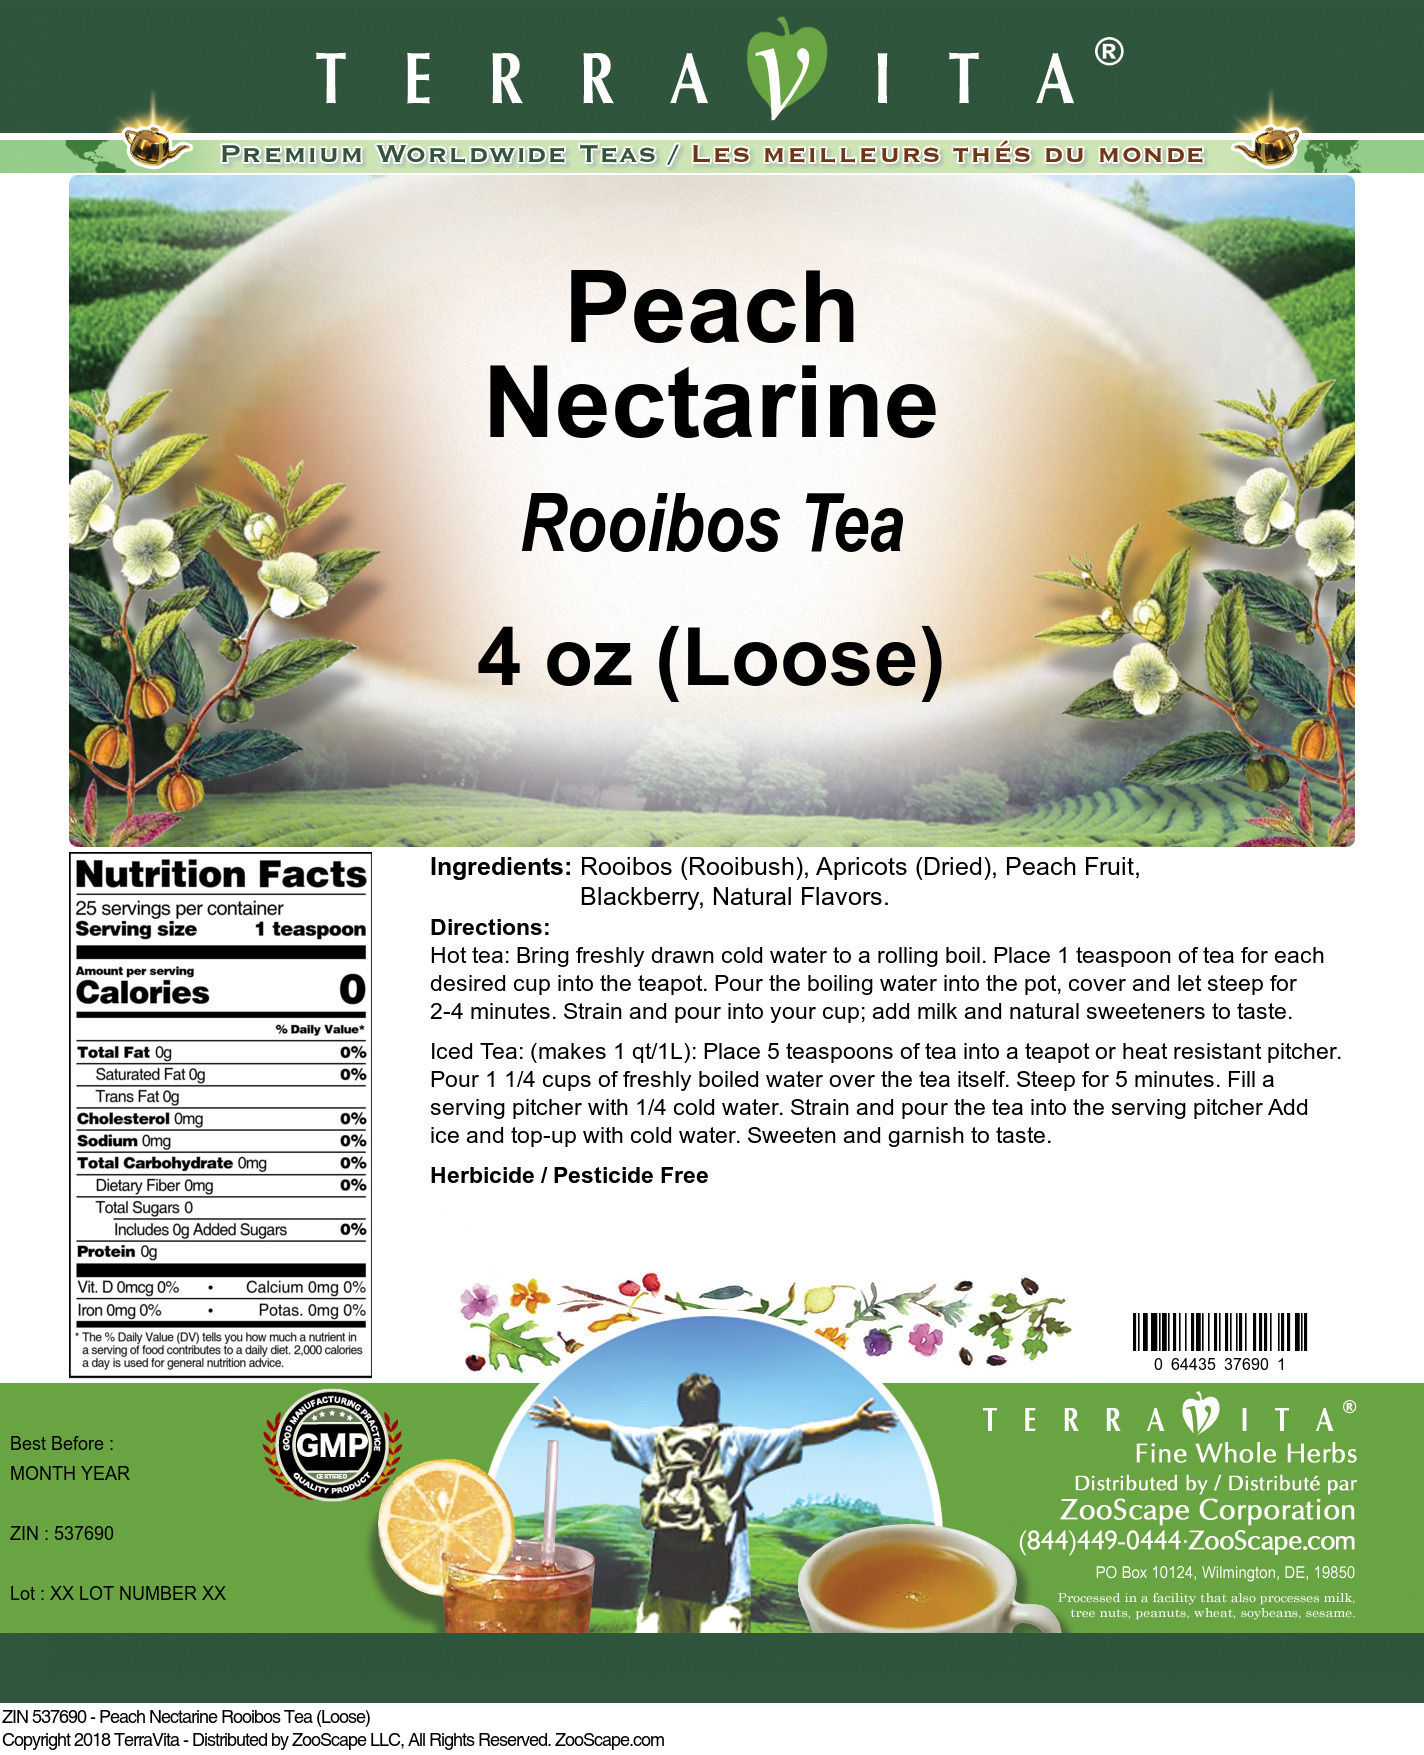 Peach Nectarine Rooibos Tea (Loose)